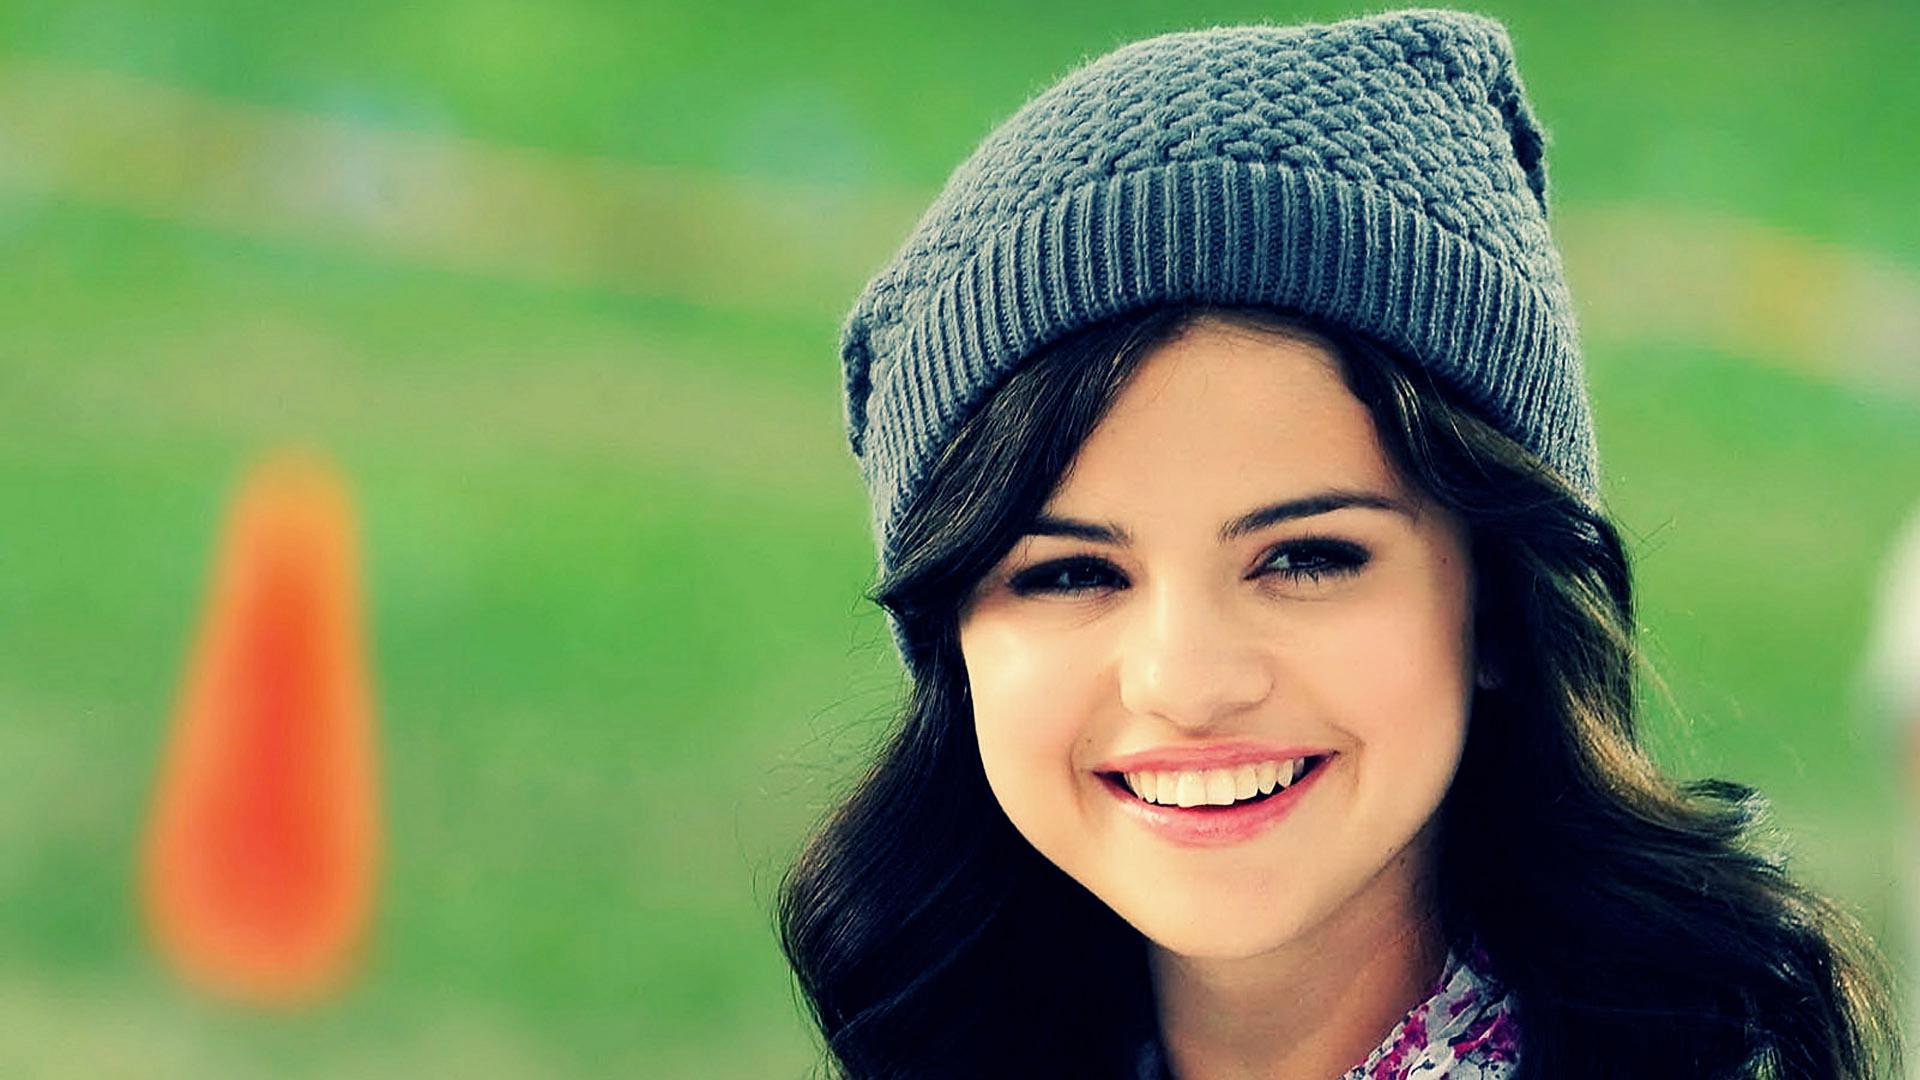 Selena Gomez in high resolution for Get Wallpaper Selena Gomez 1920x1080